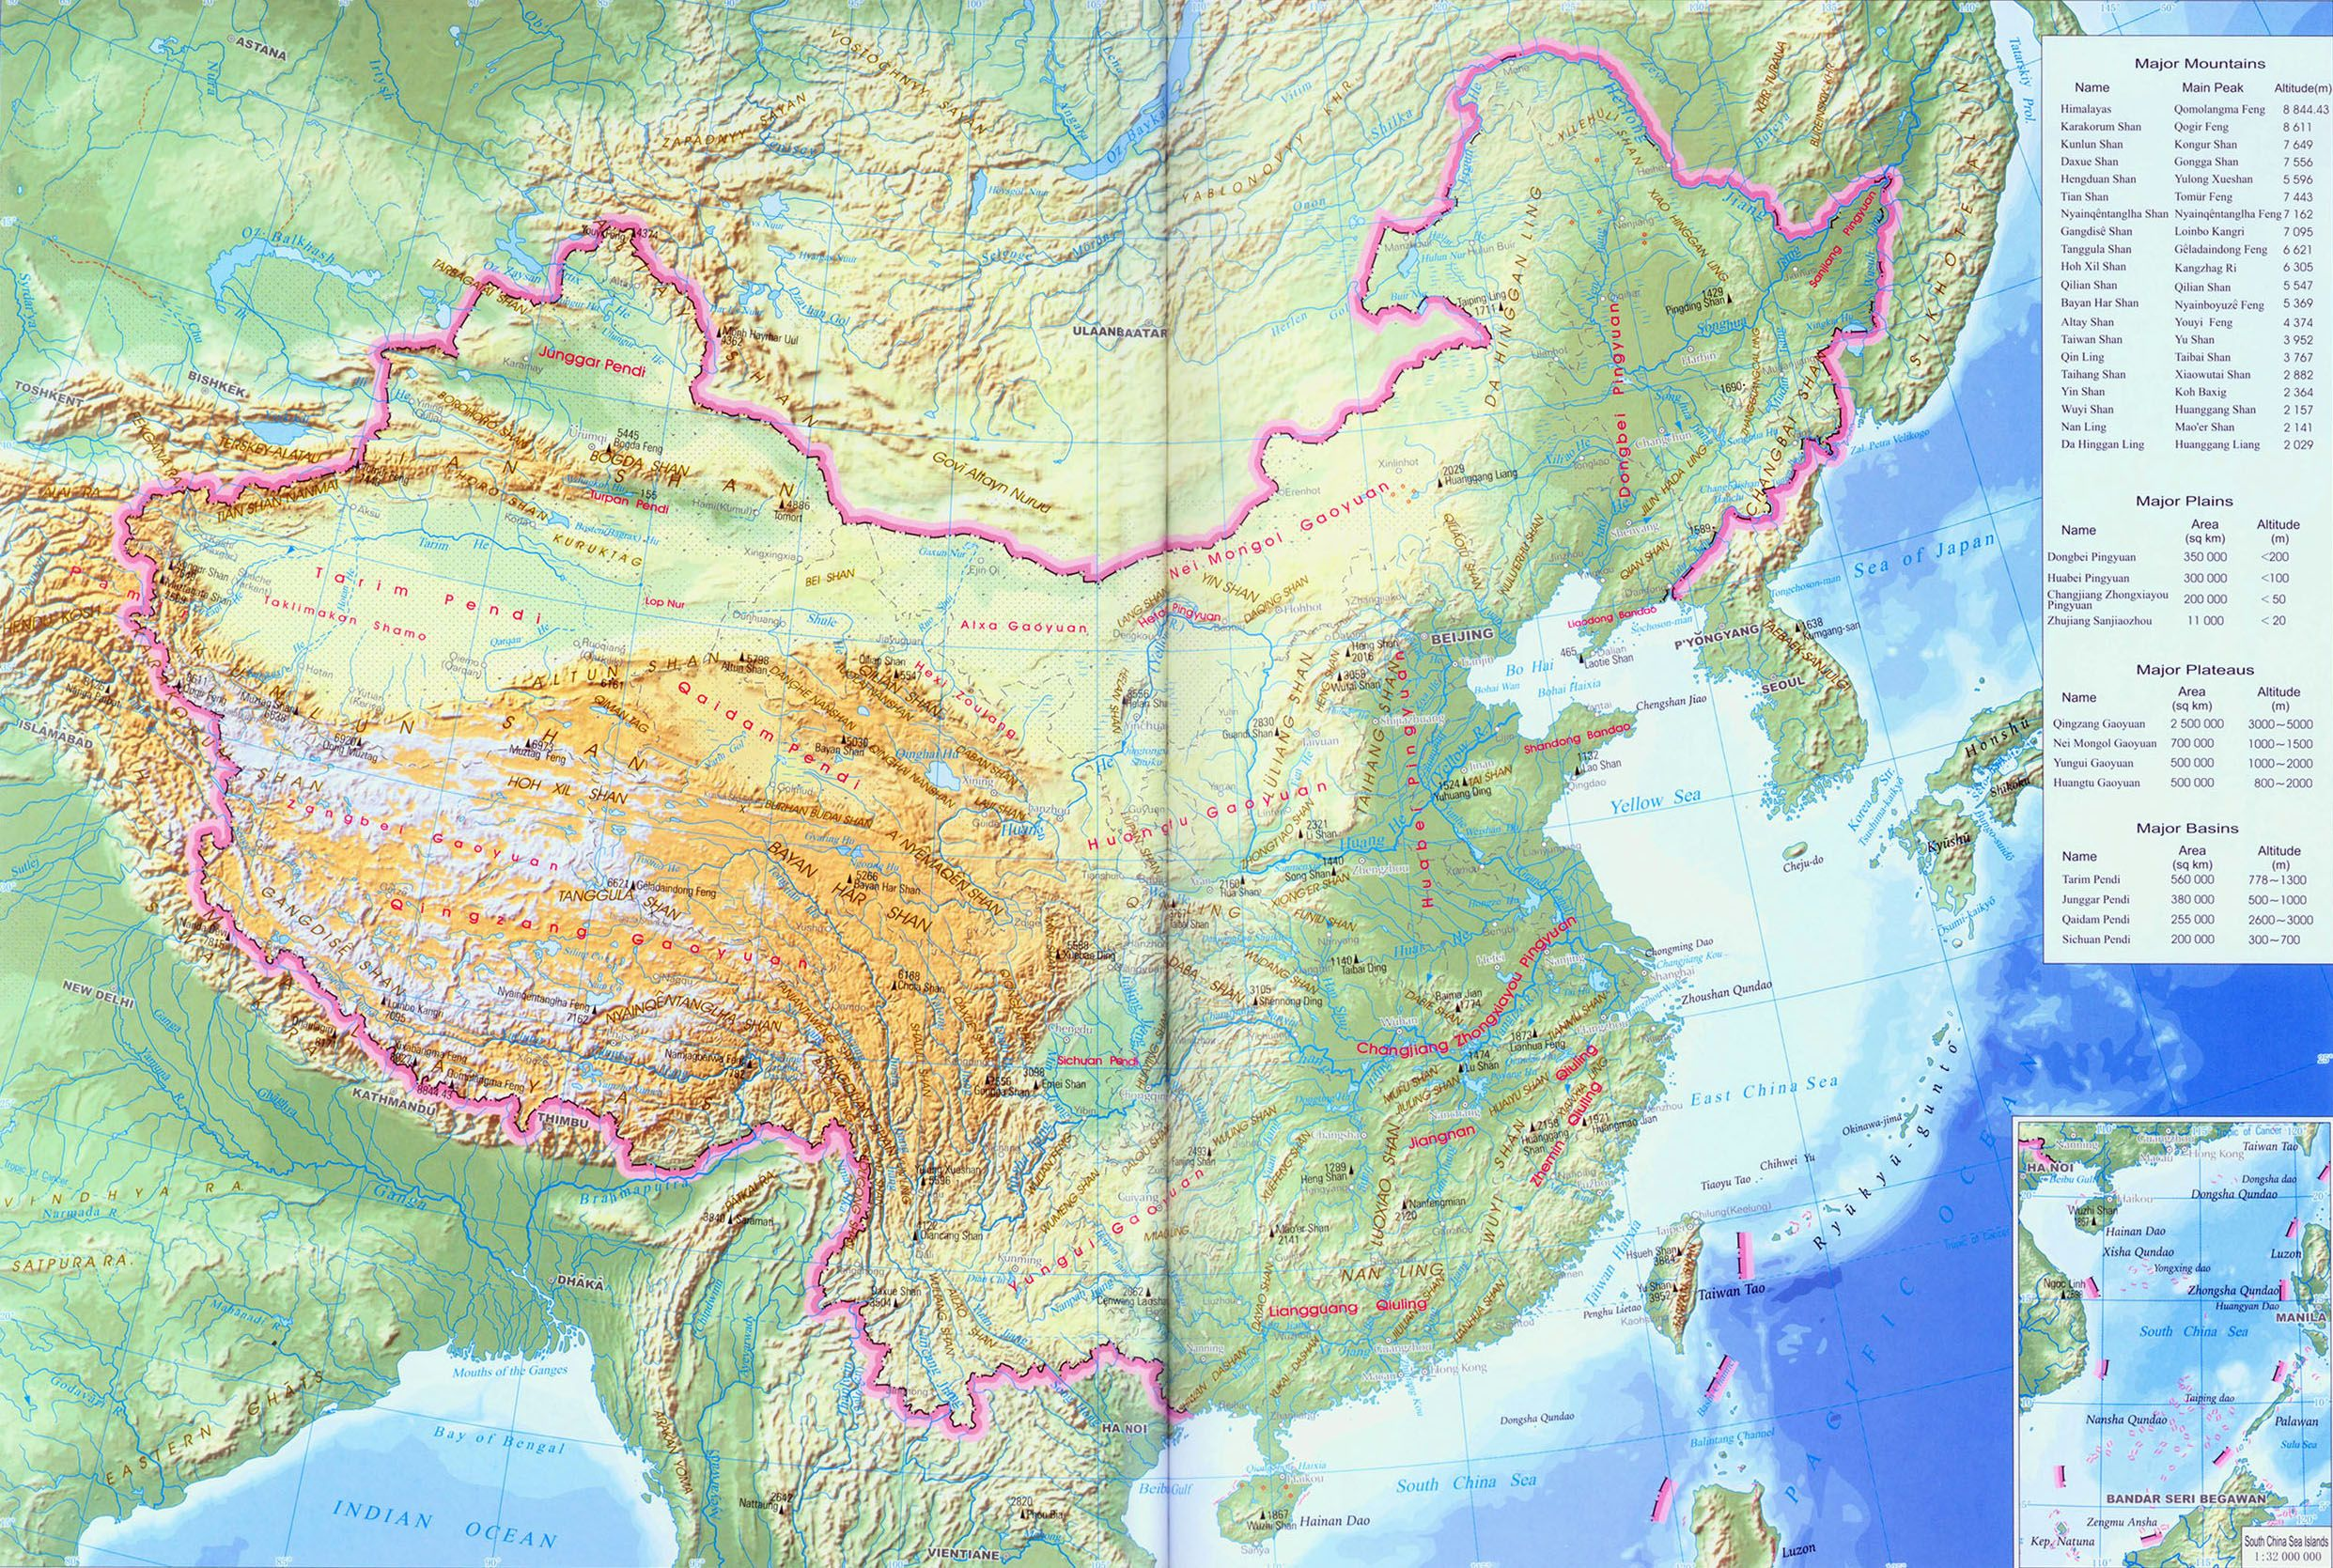 China physical map china maps pinterest china and topographic map china physical map gumiabroncs Image collections